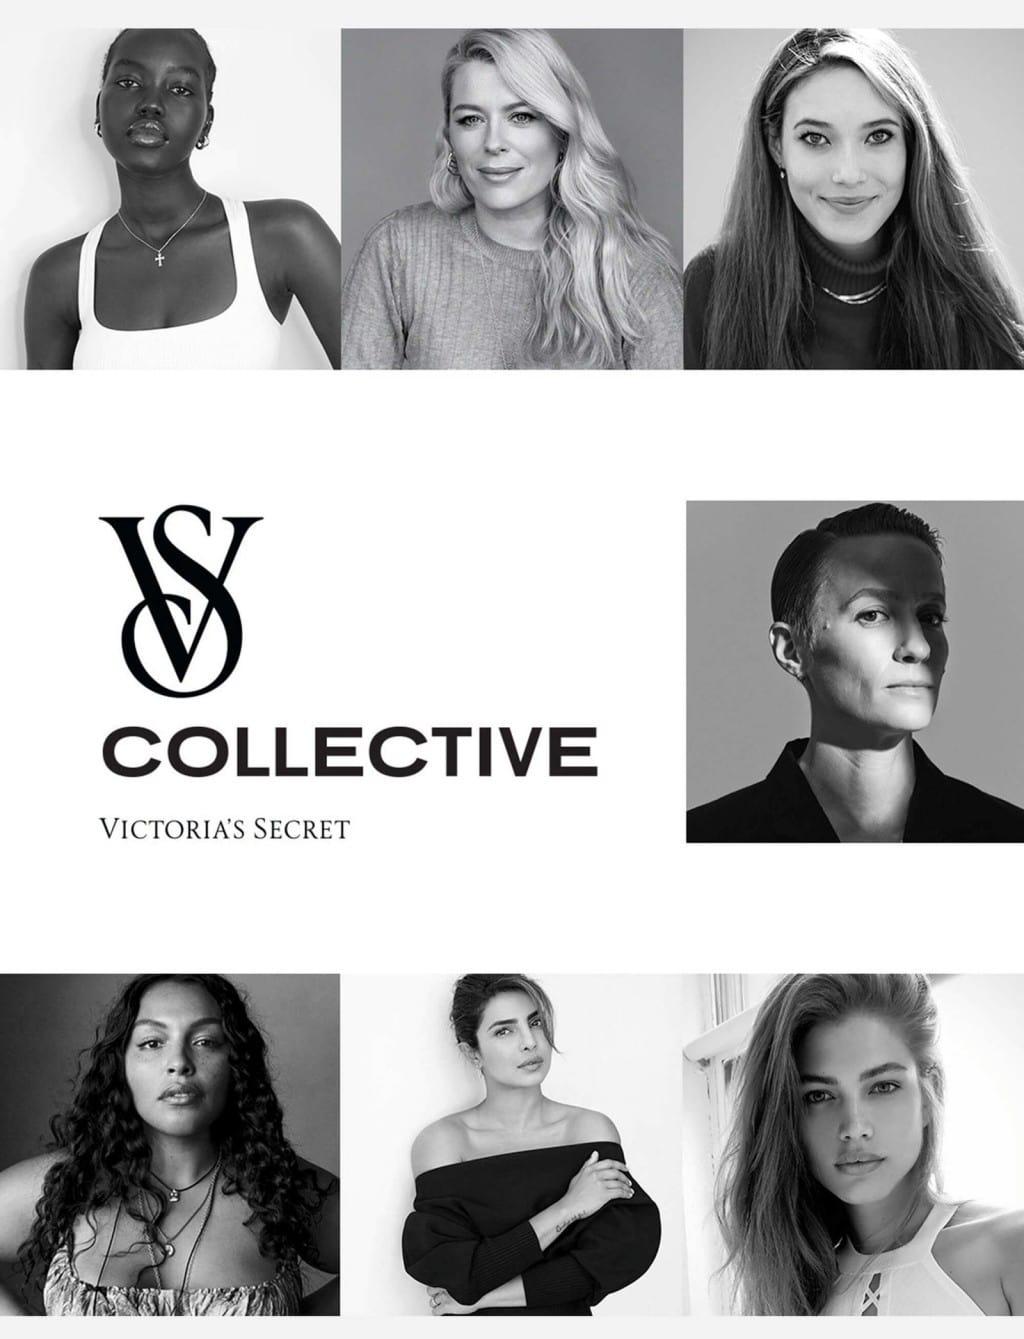 Victoria 's Secret Angels를 대체하는 VS Collective, 평등 운동가 Amanda de Cadet, 신체 옹호자 Paloma Elsesser 및 LGBTQ + 활동가 Valentina Sampaio 등이 포된 특징을 보여준다, Image from Victoria's Secret